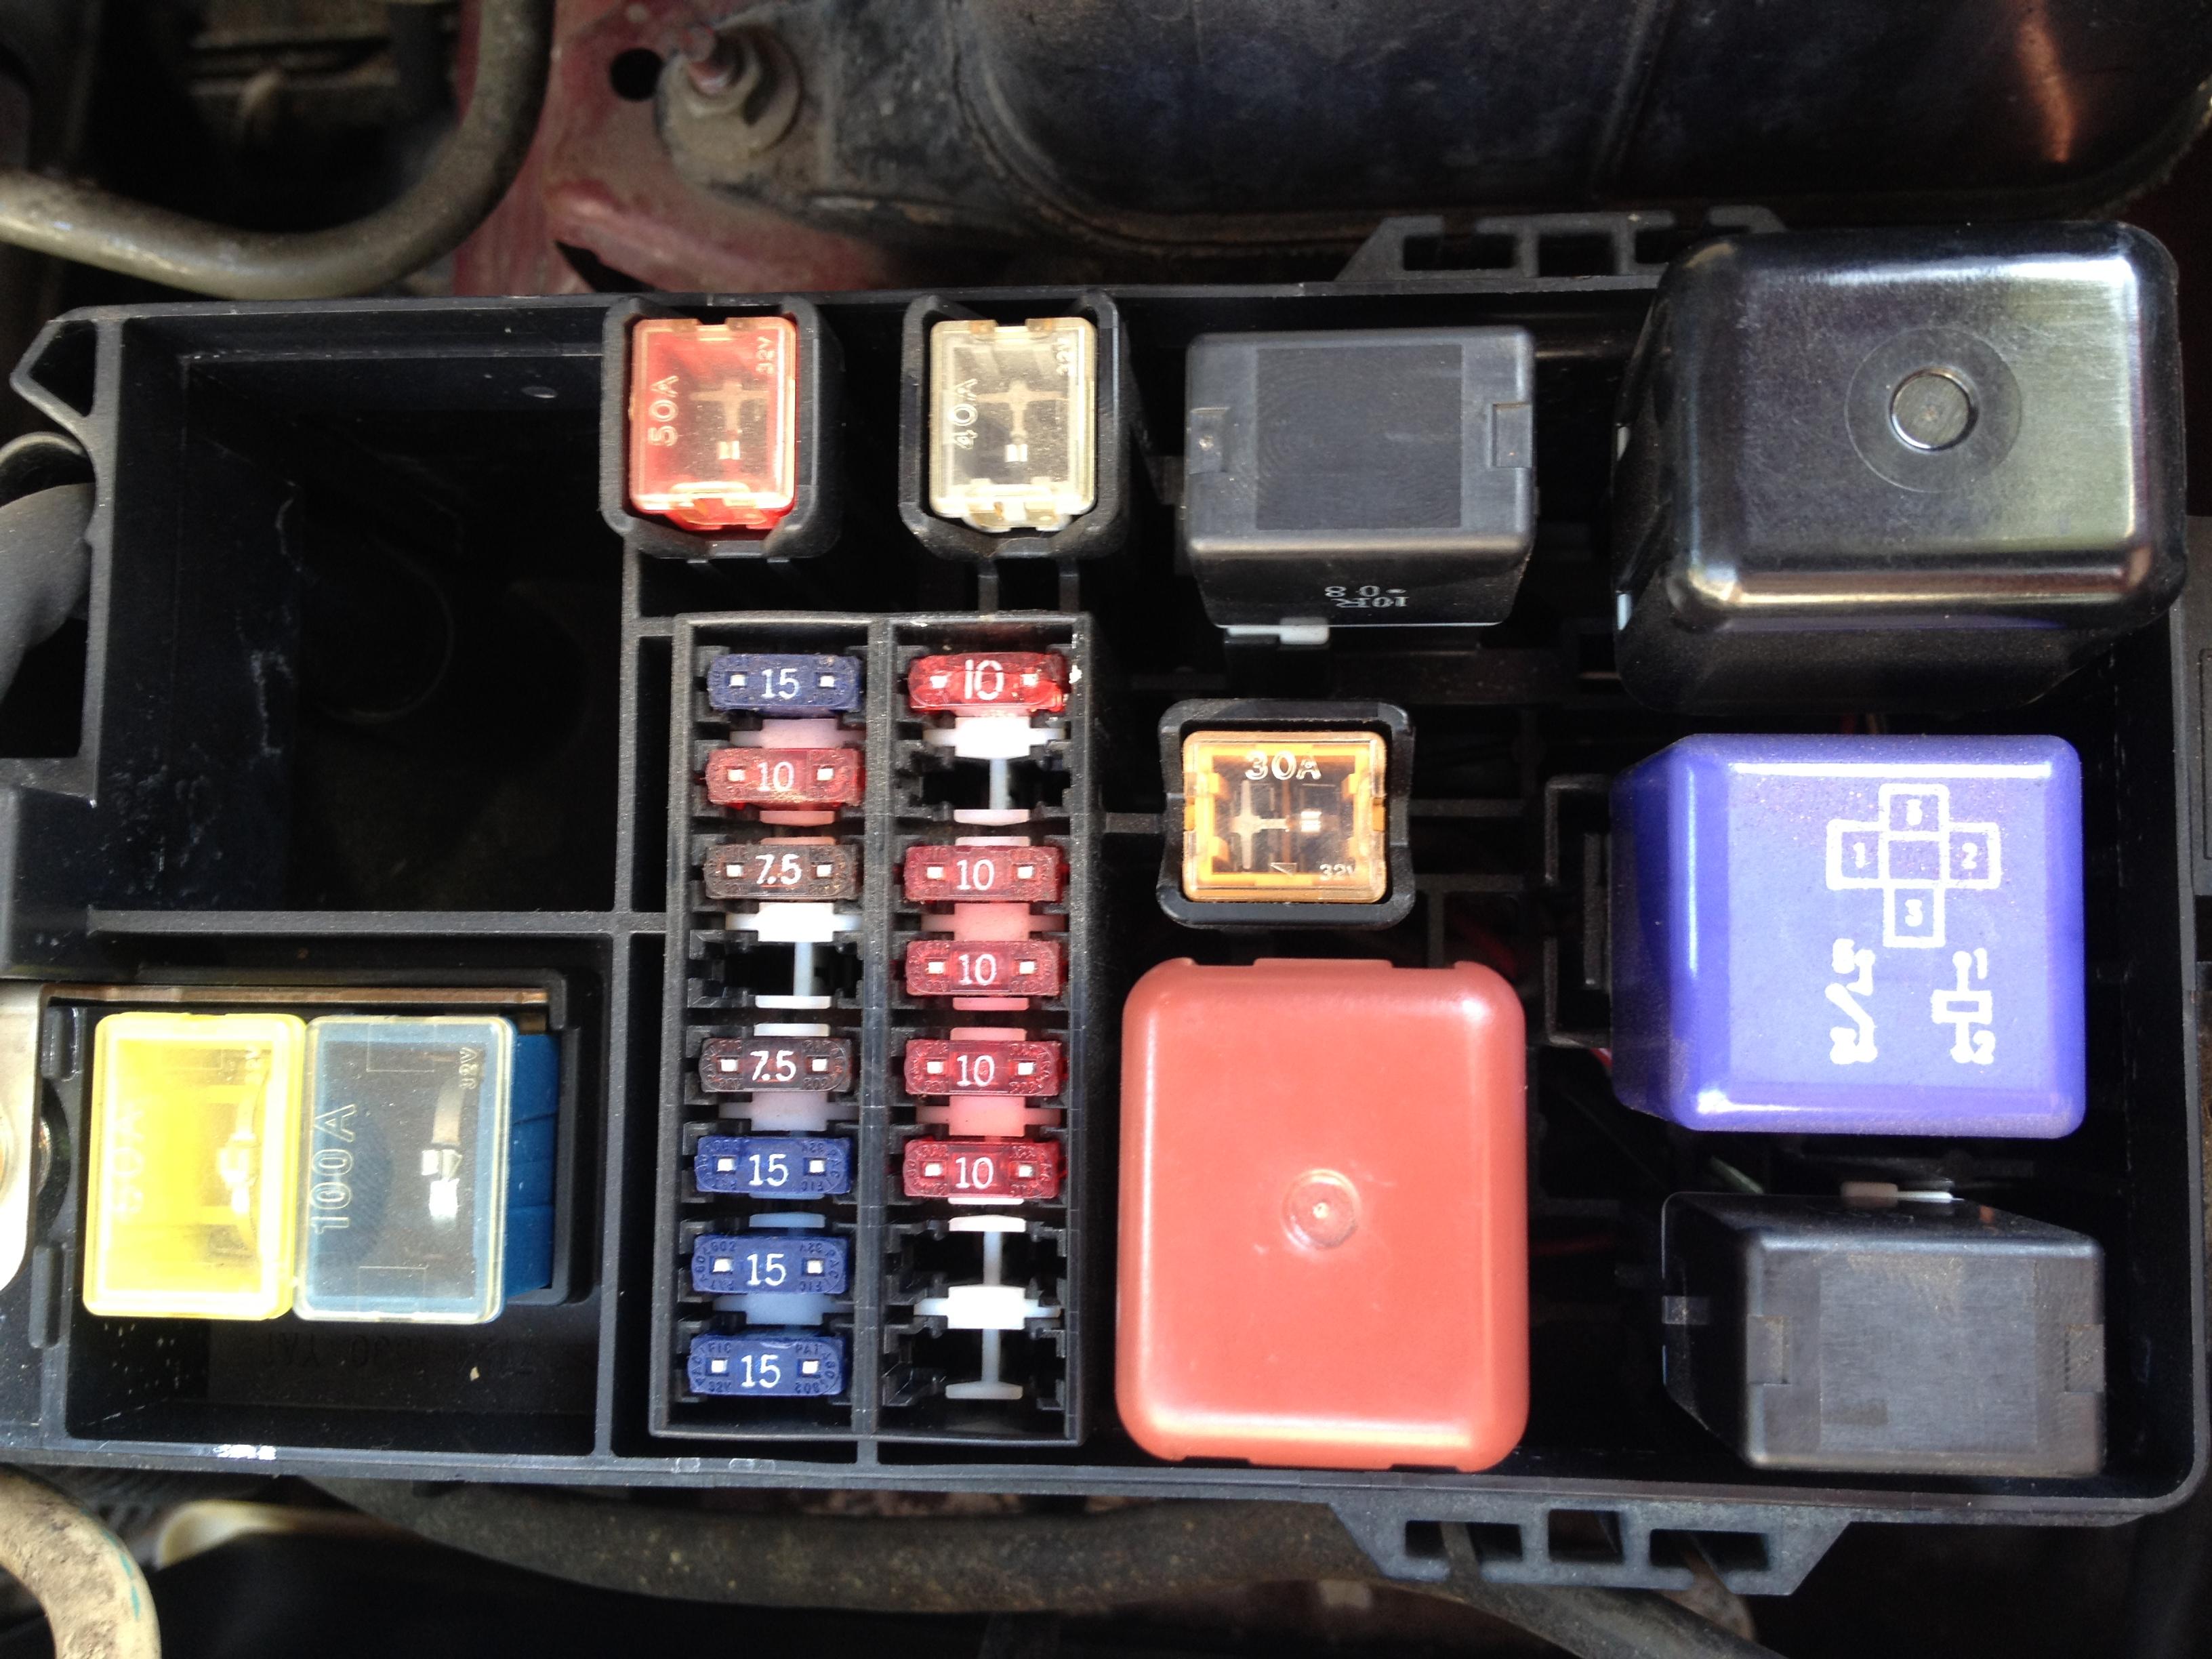 4runner fuse box diagram ge 3651  1996 toyota t100 fuse box diagram schematic wiring 2012 4runner fuse box diagram 1996 toyota t100 fuse box diagram